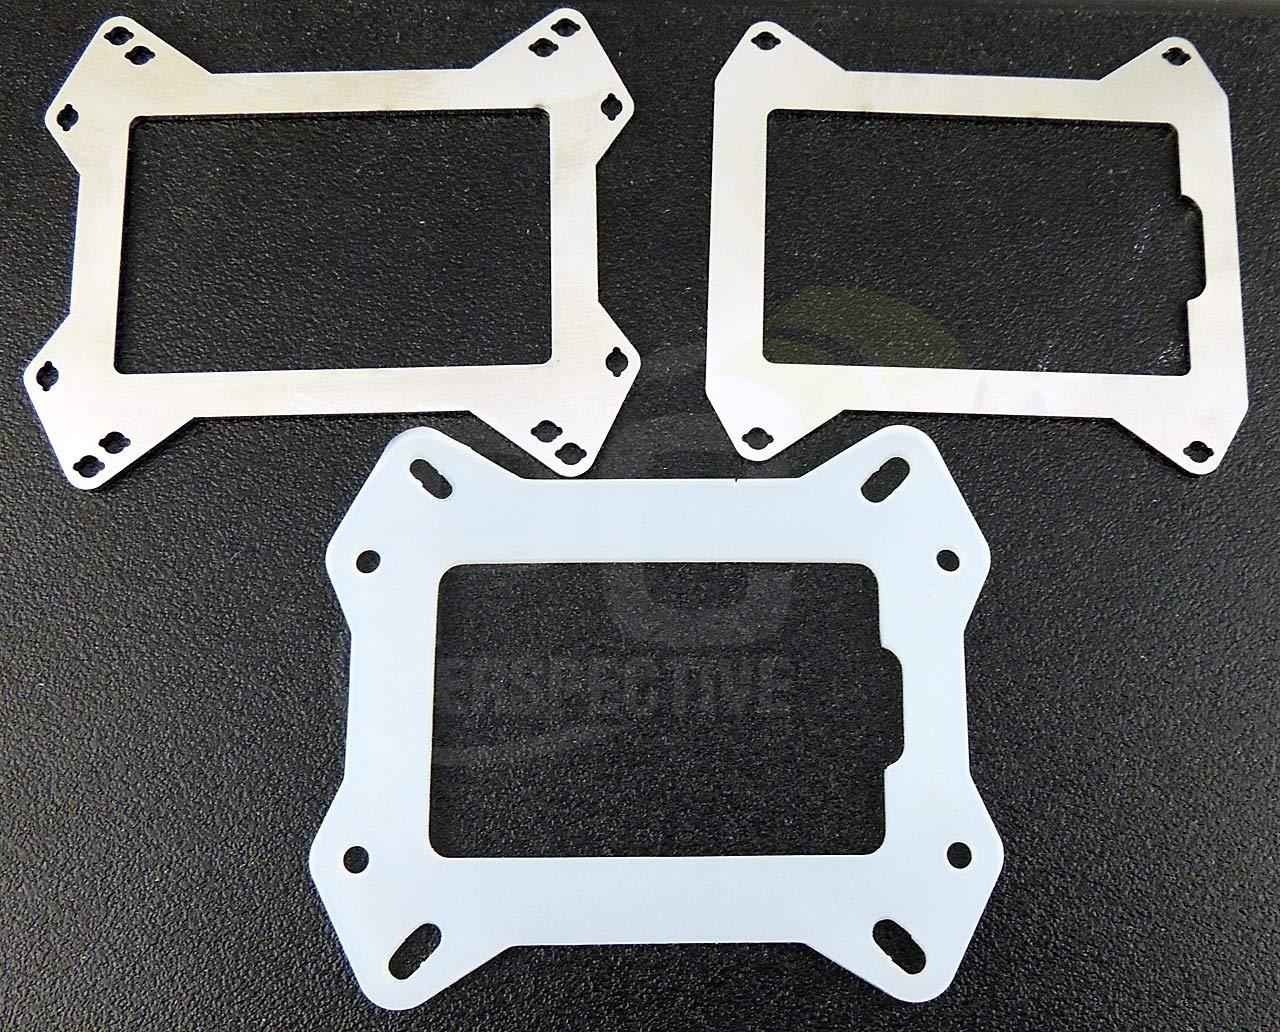 03-hardware-bottom-plates-intel.jpg